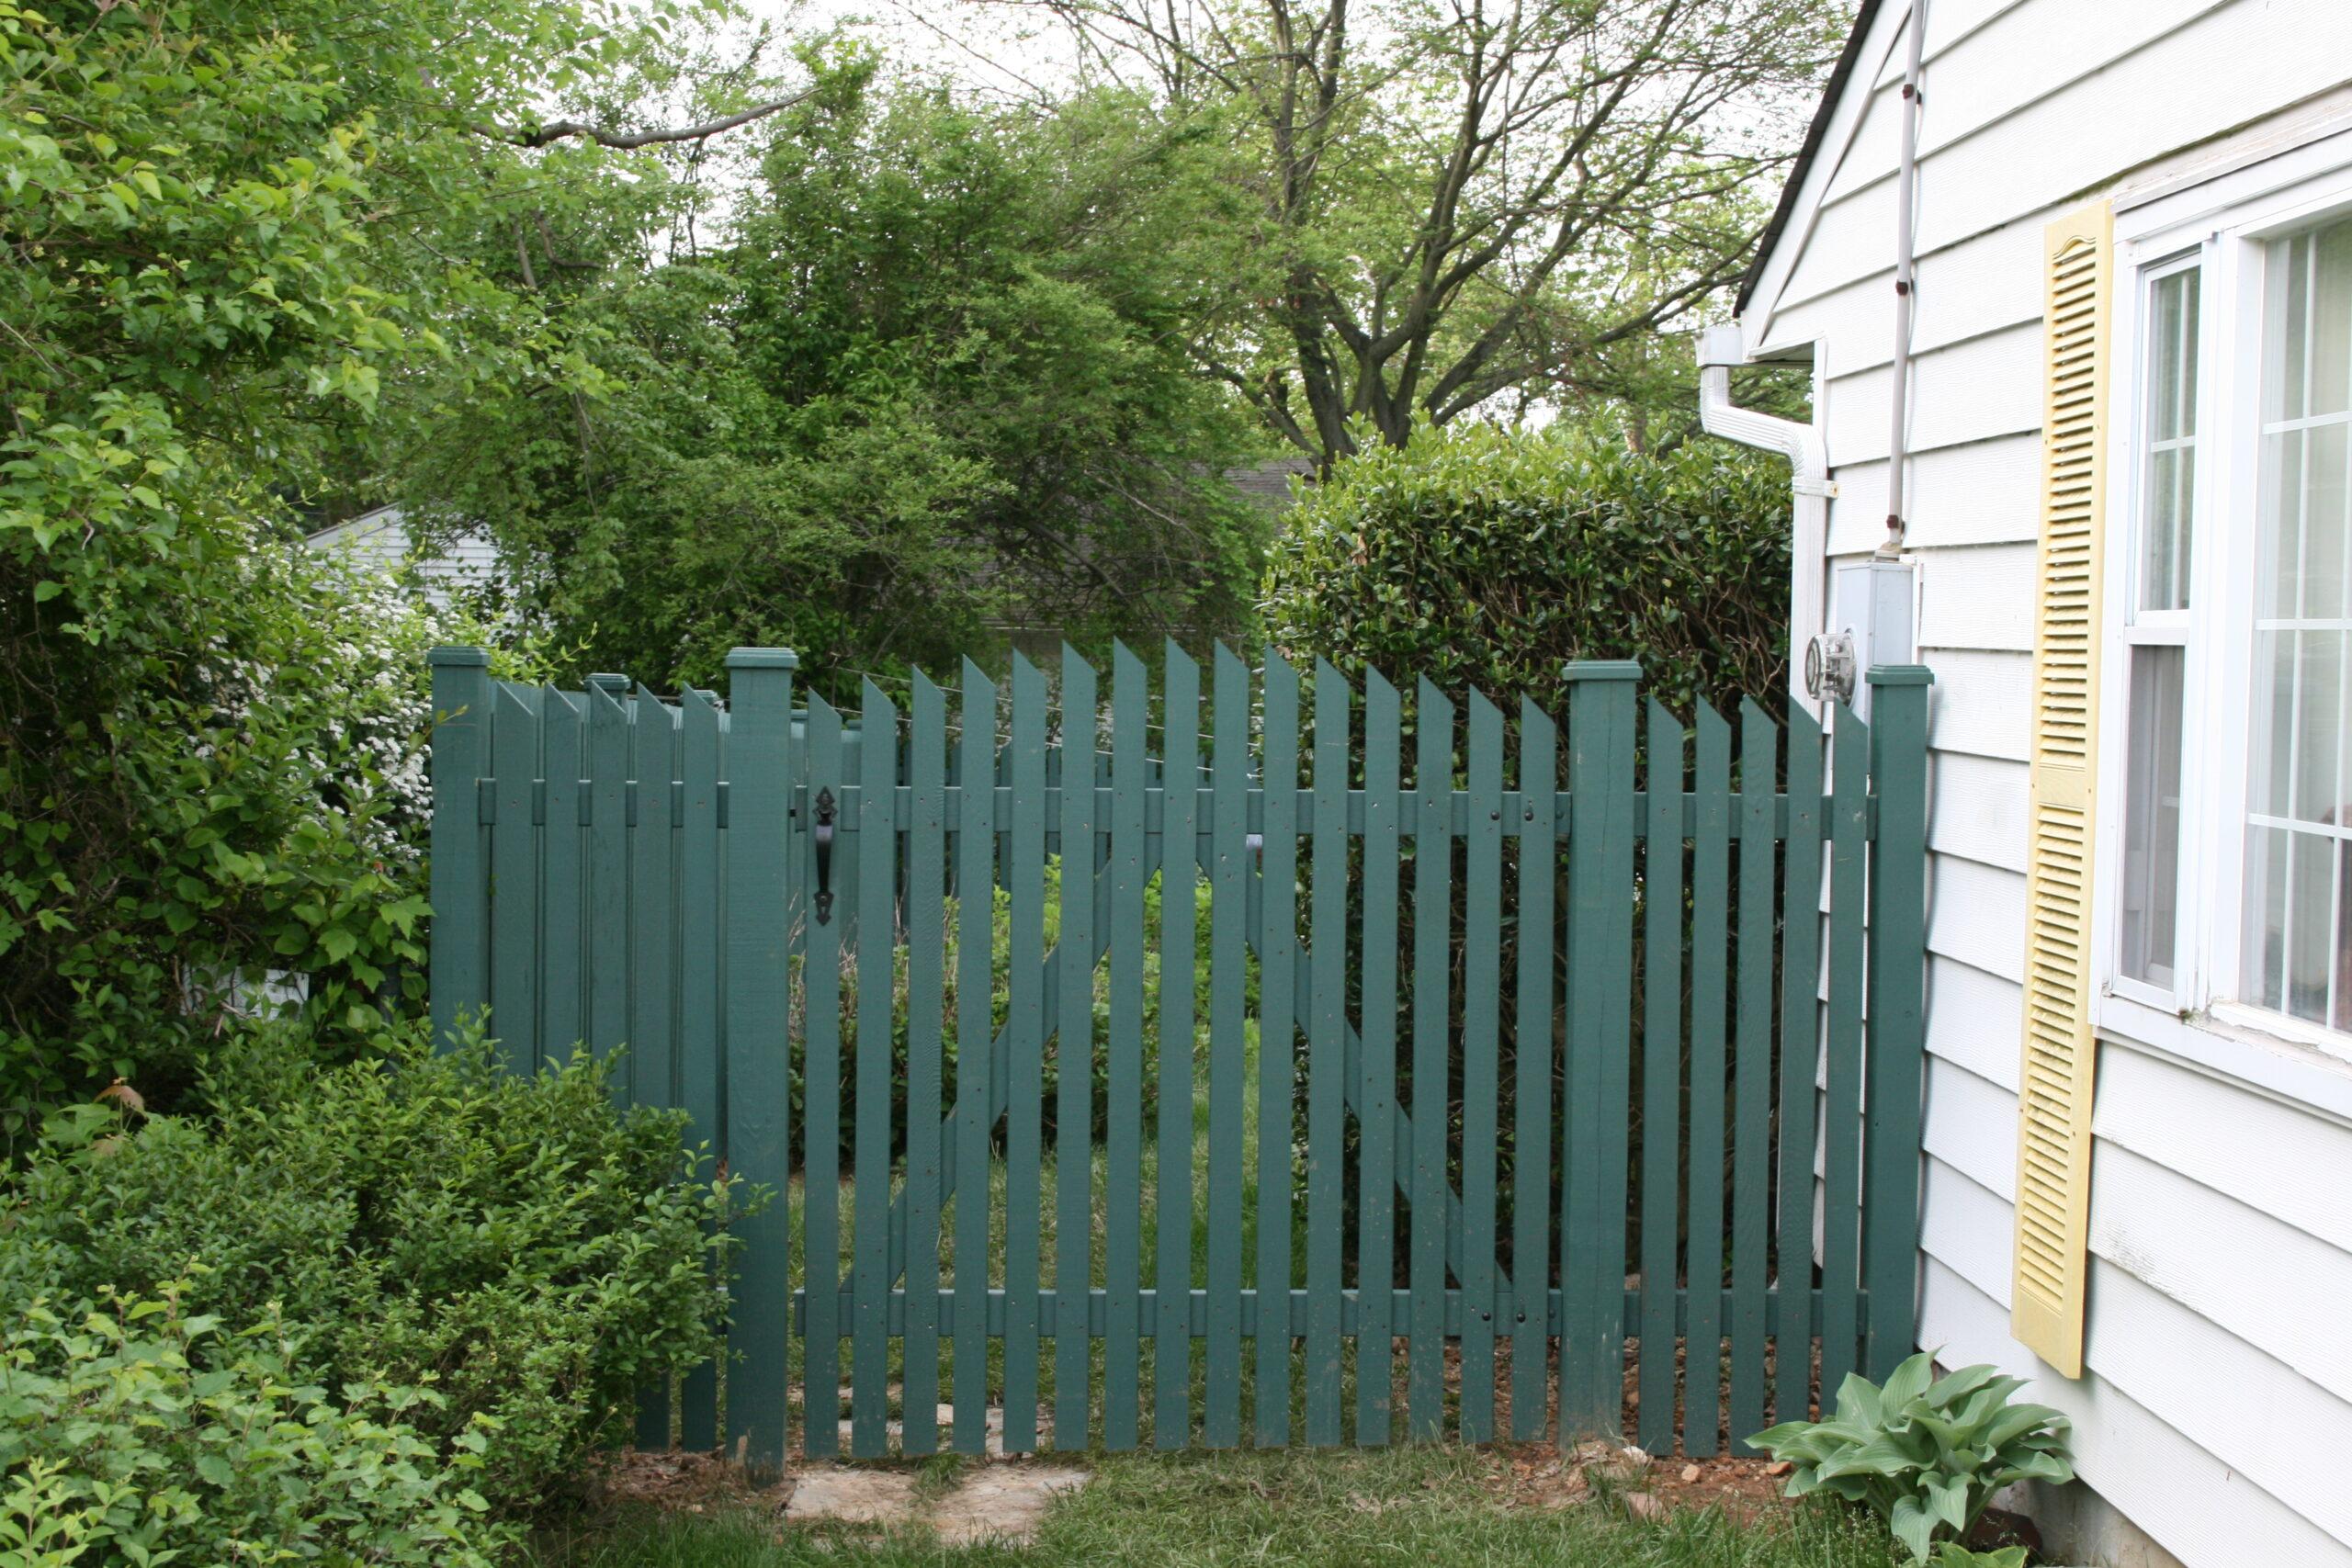 GATES (26)